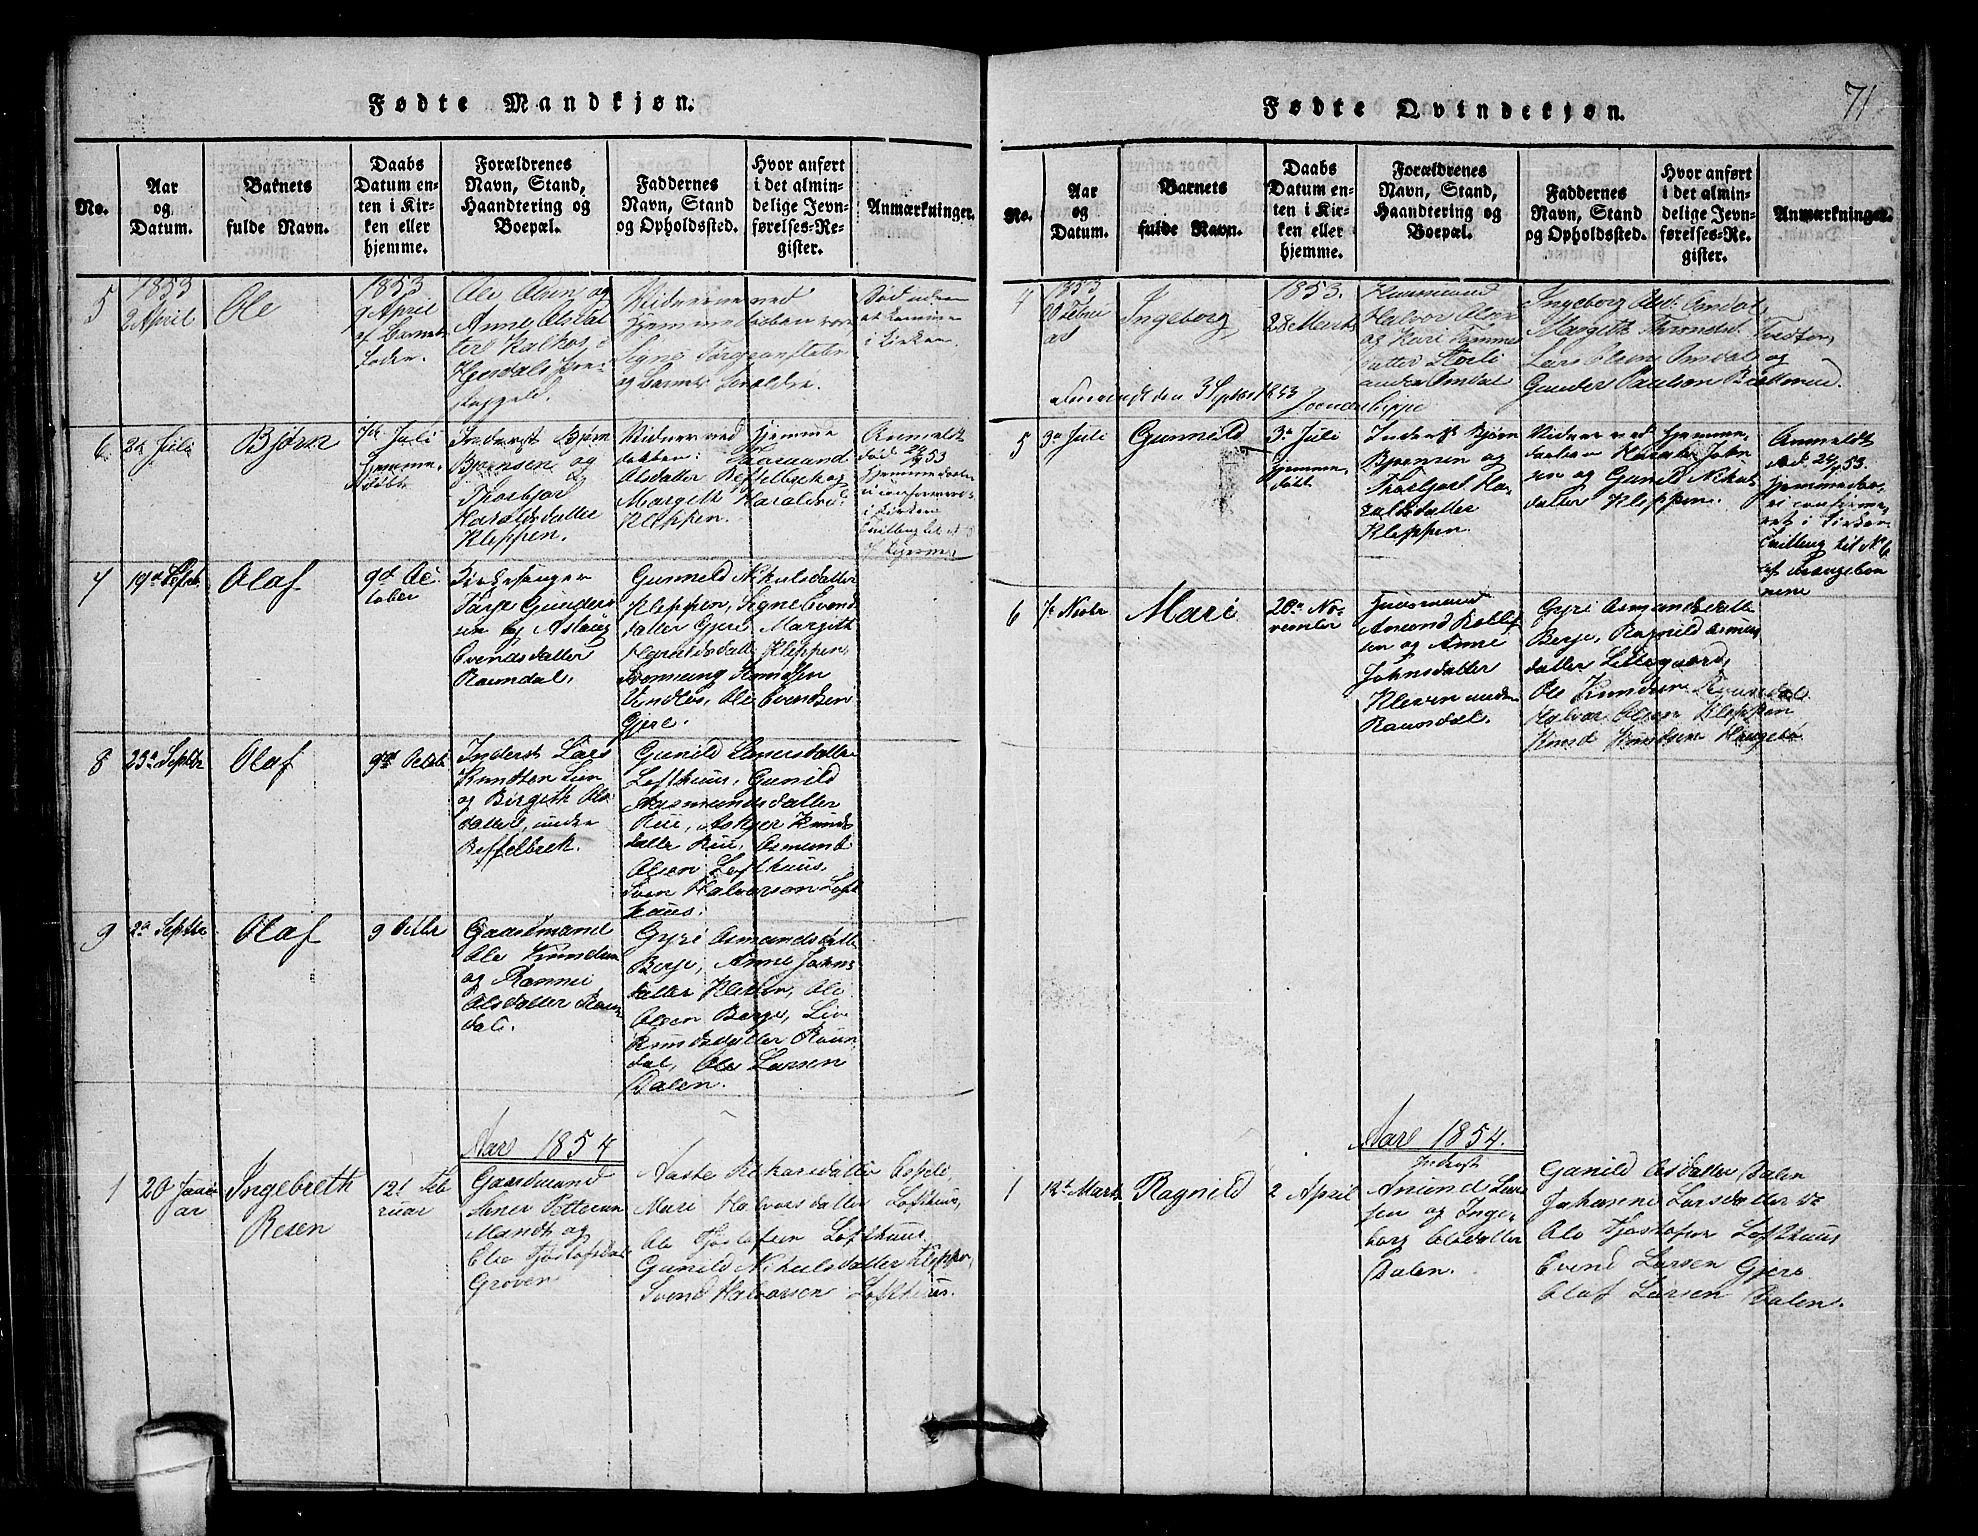 SAKO, Lårdal kirkebøker, G/Gb/L0001: Klokkerbok nr. II 1, 1815-1865, s. 71